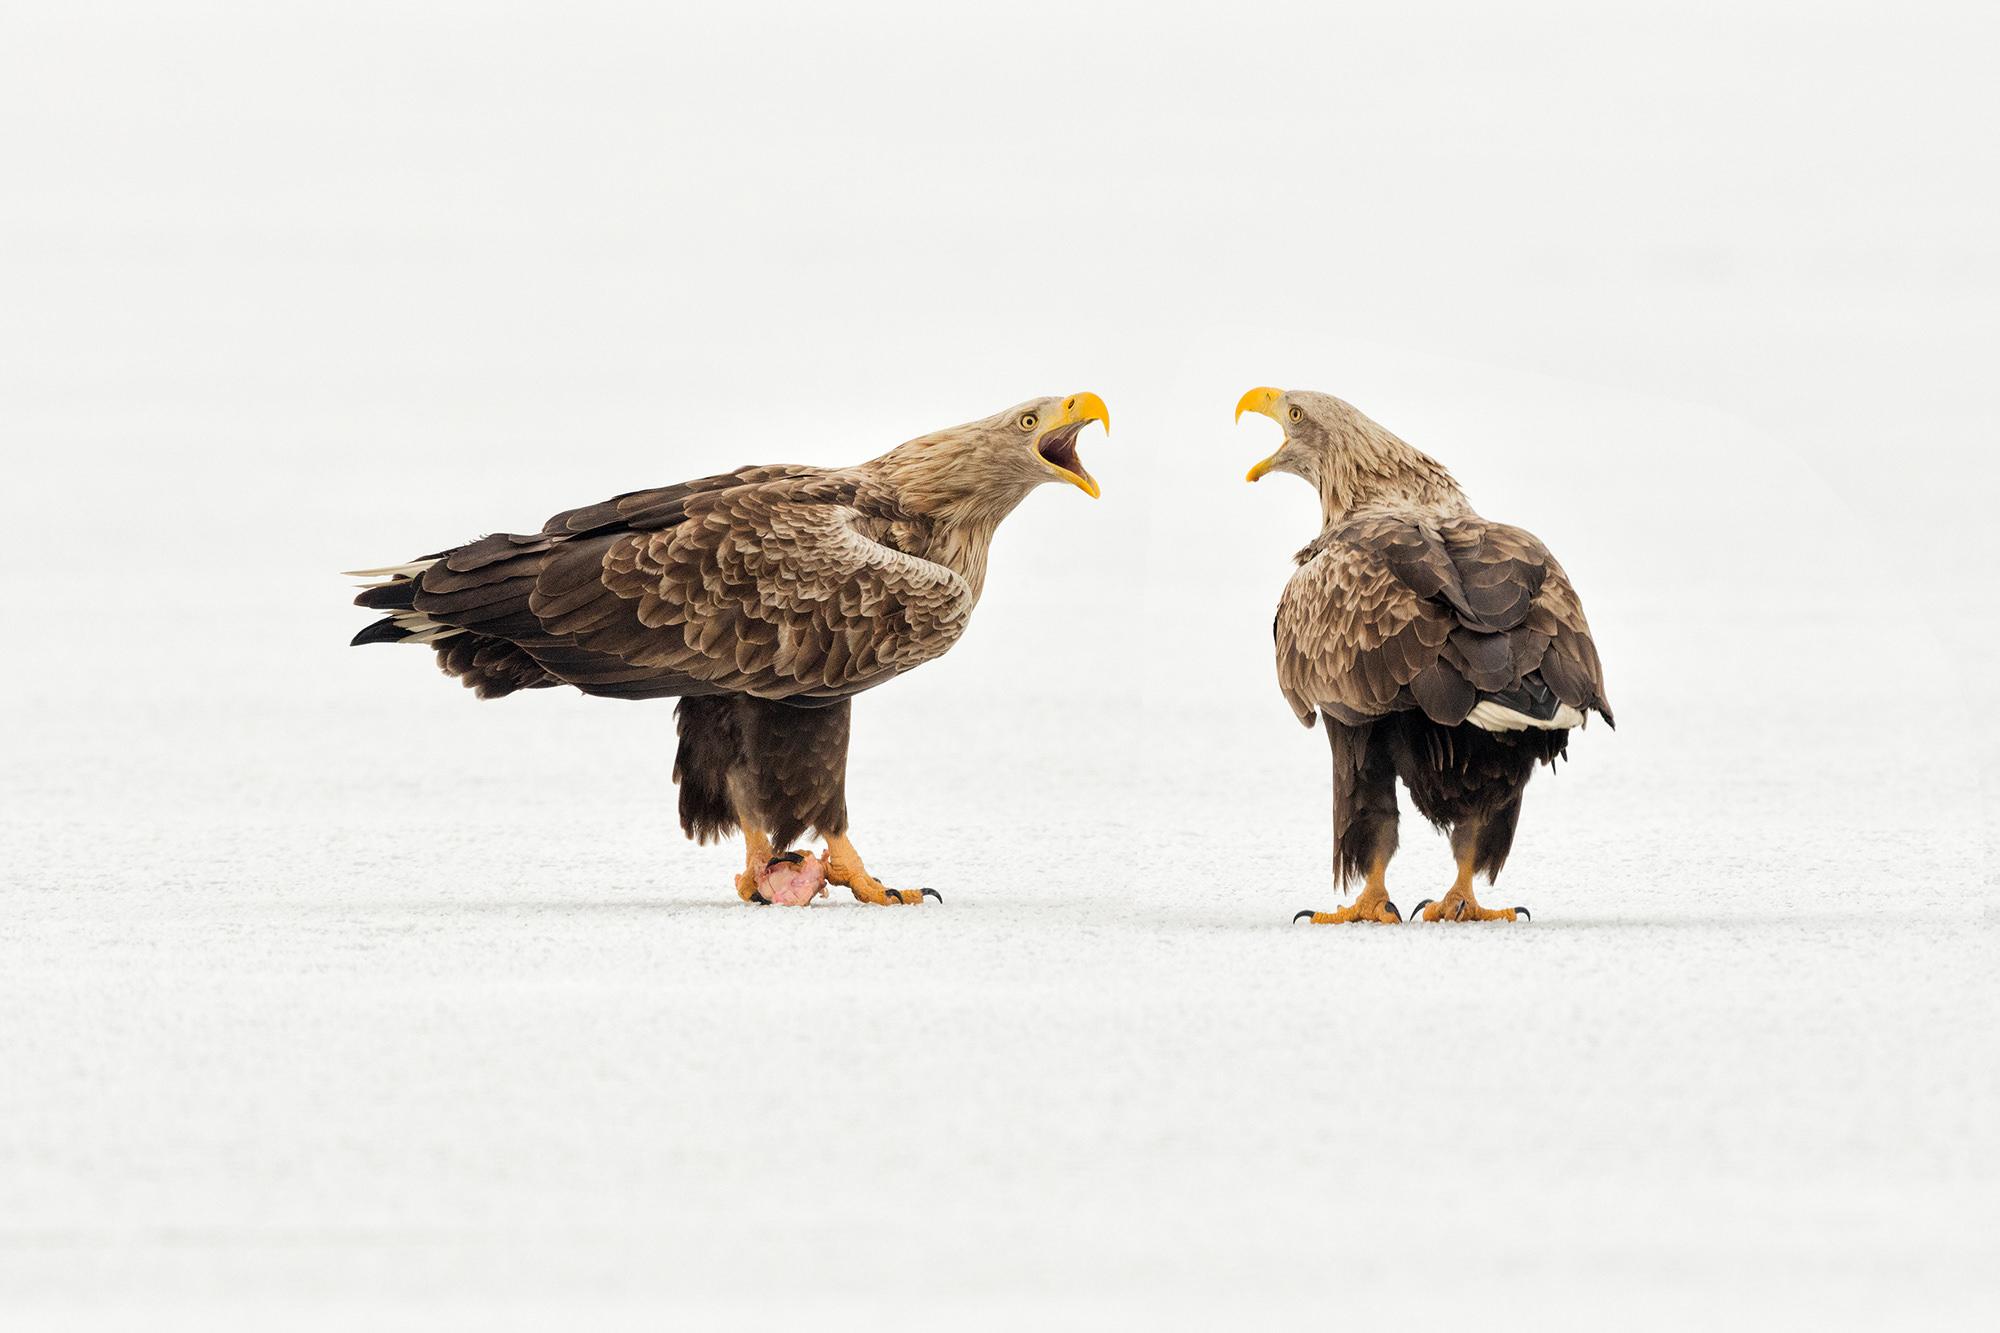 Rétisas, White-tailed Eagle, Seeadler, Haliaeetus albicilla